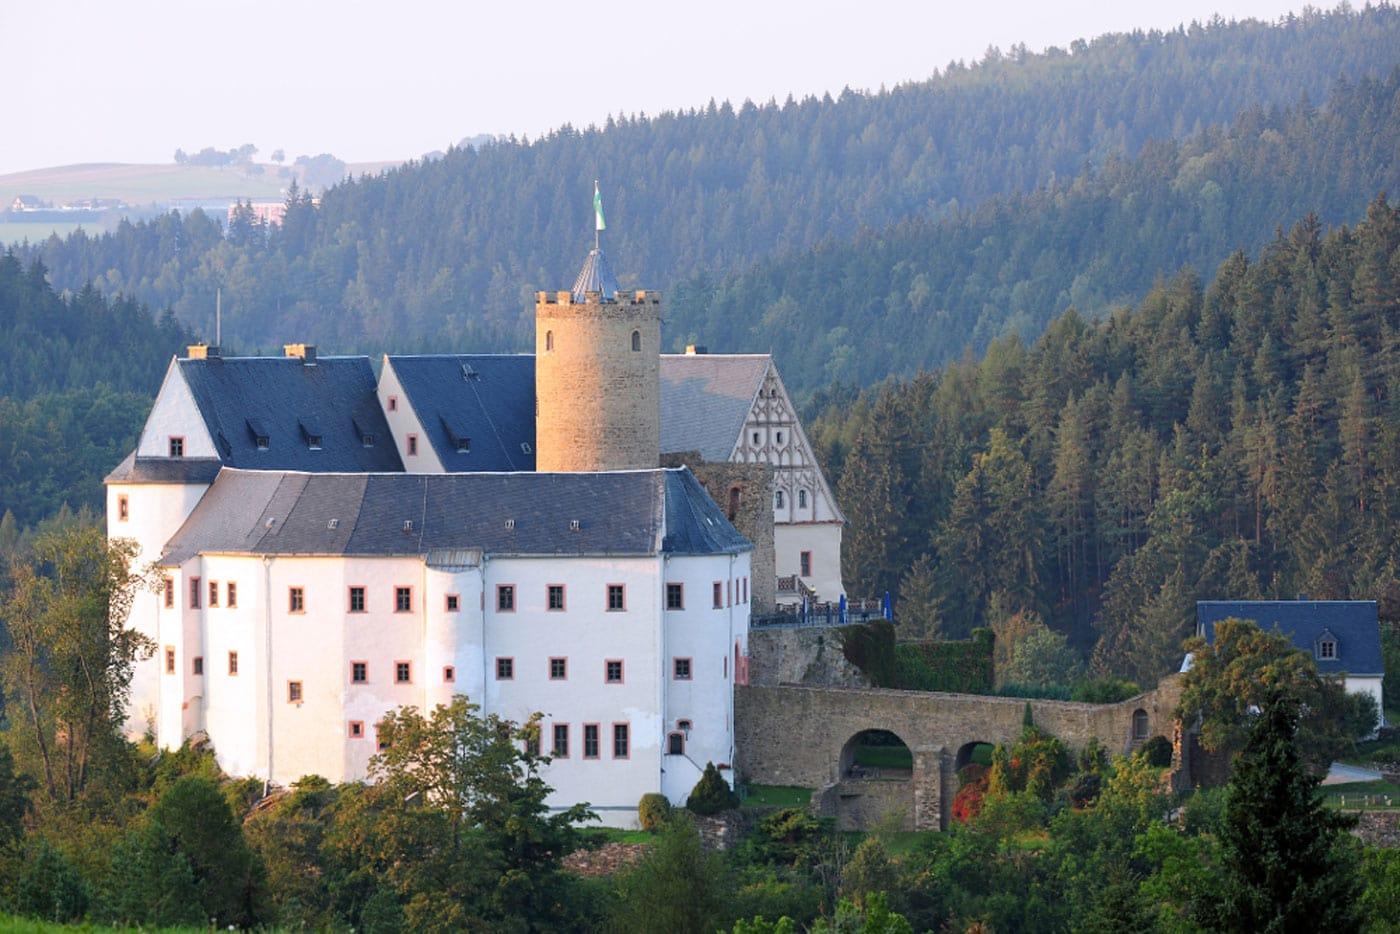 Burg Scharfenstein im Erzgebirge // HIMBEER